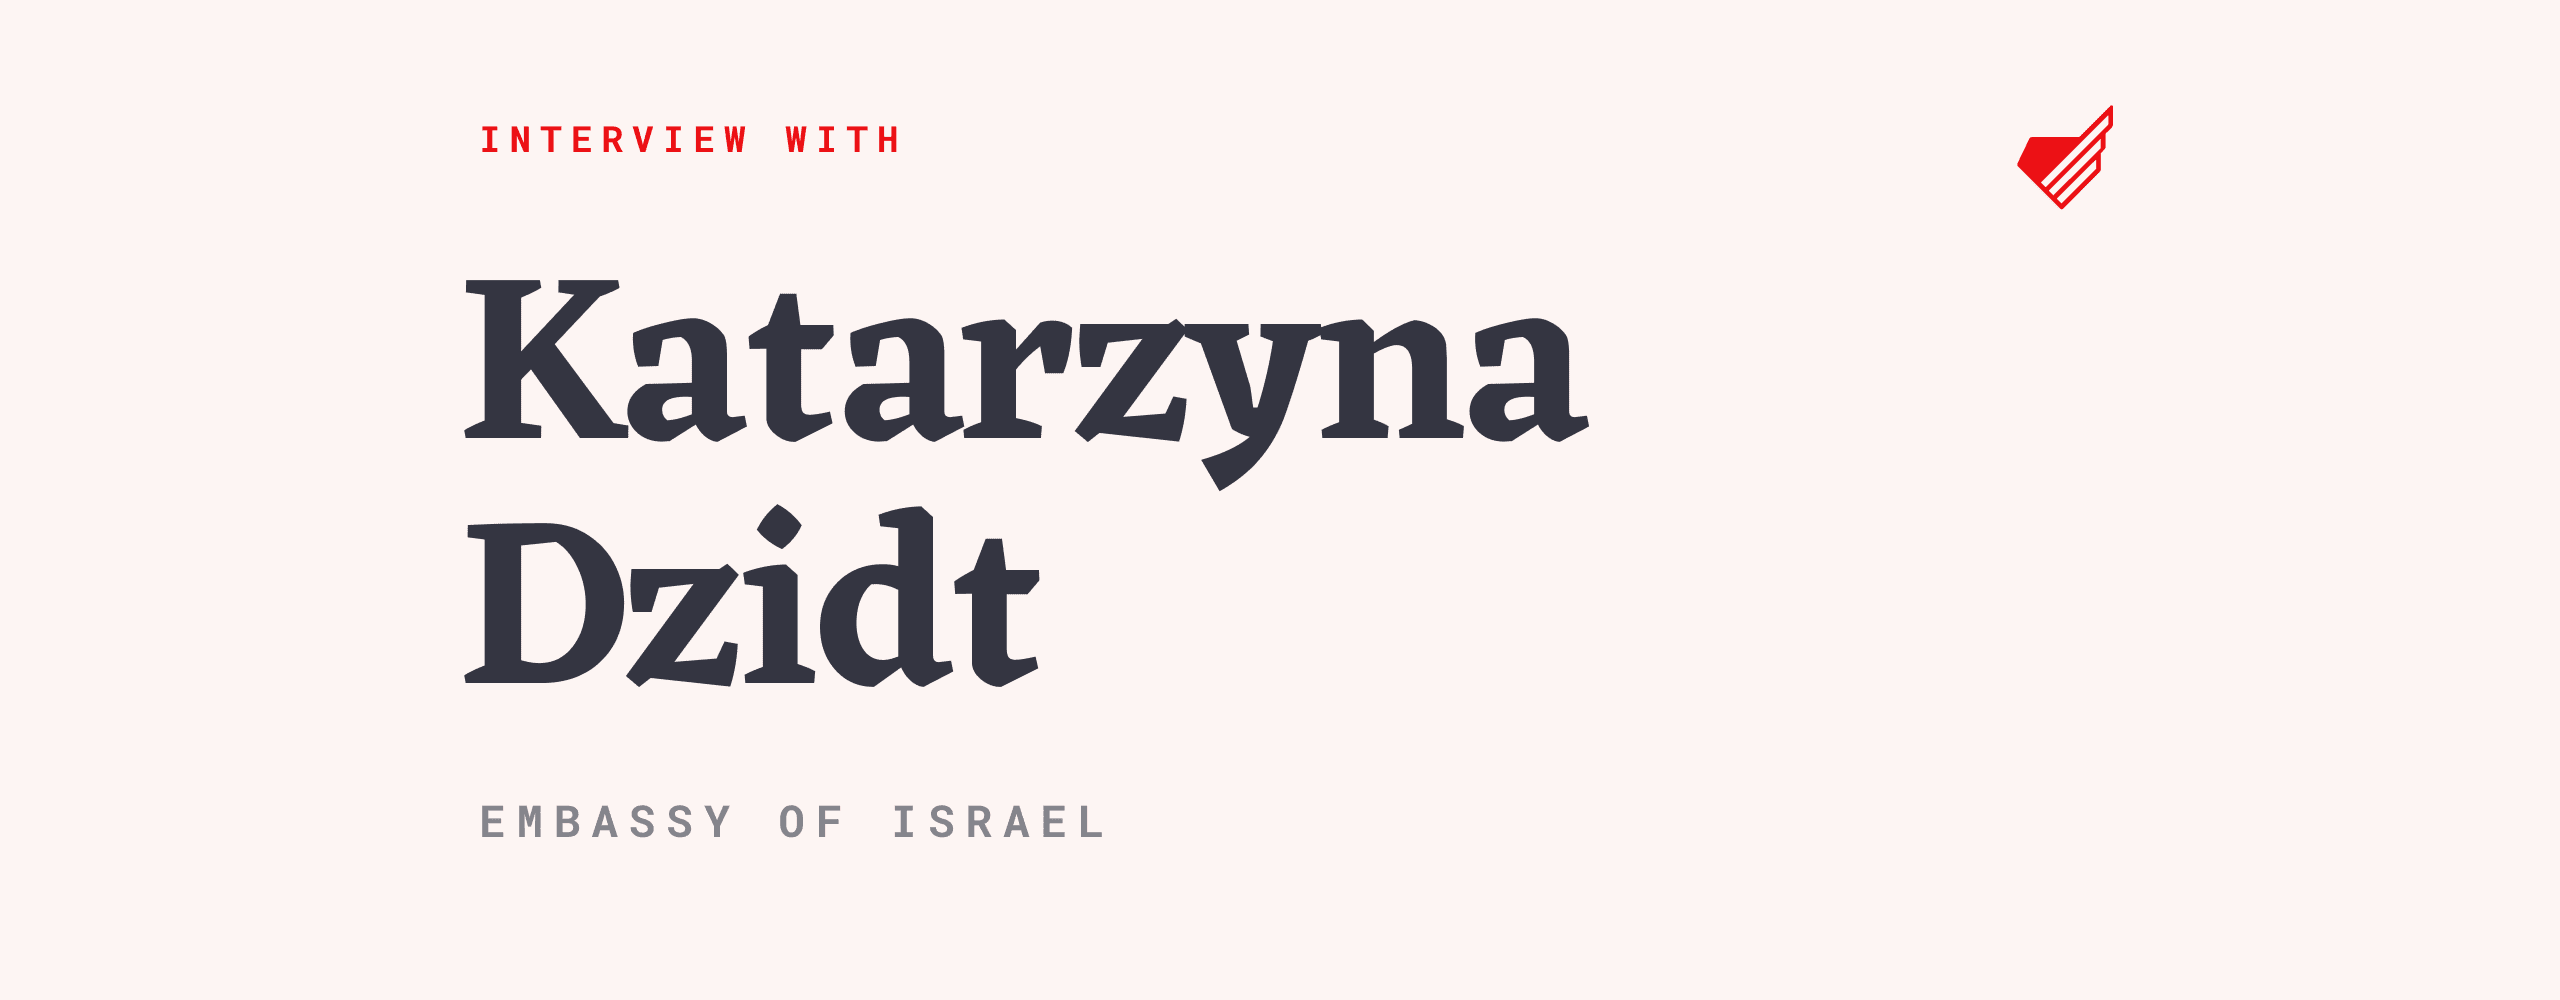 katarzyna-dzidt-interview-hs